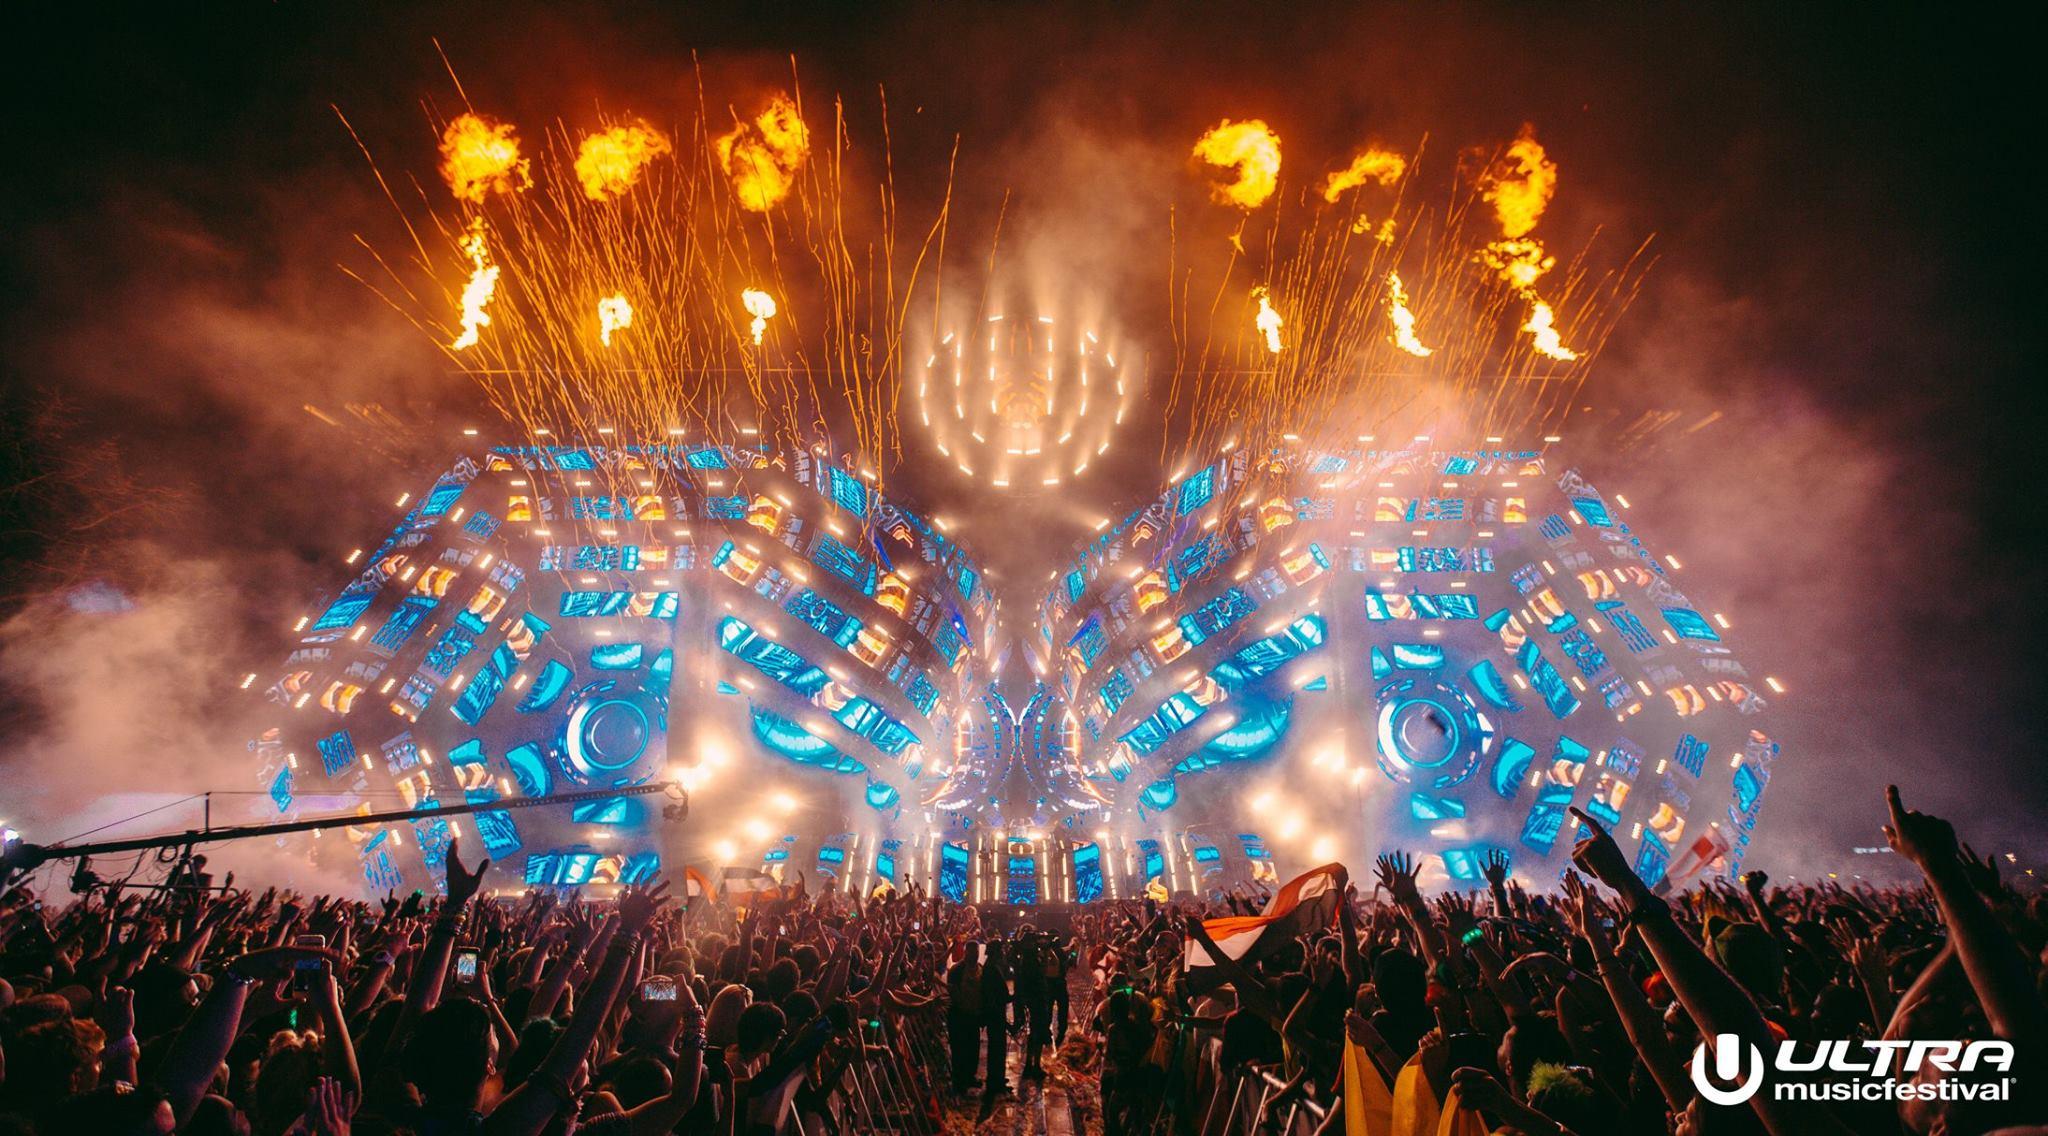 Ultra Music Festival 2018 Lineup Officially Announced, Edm Pertaining To Las Vegas Live Music Calendar